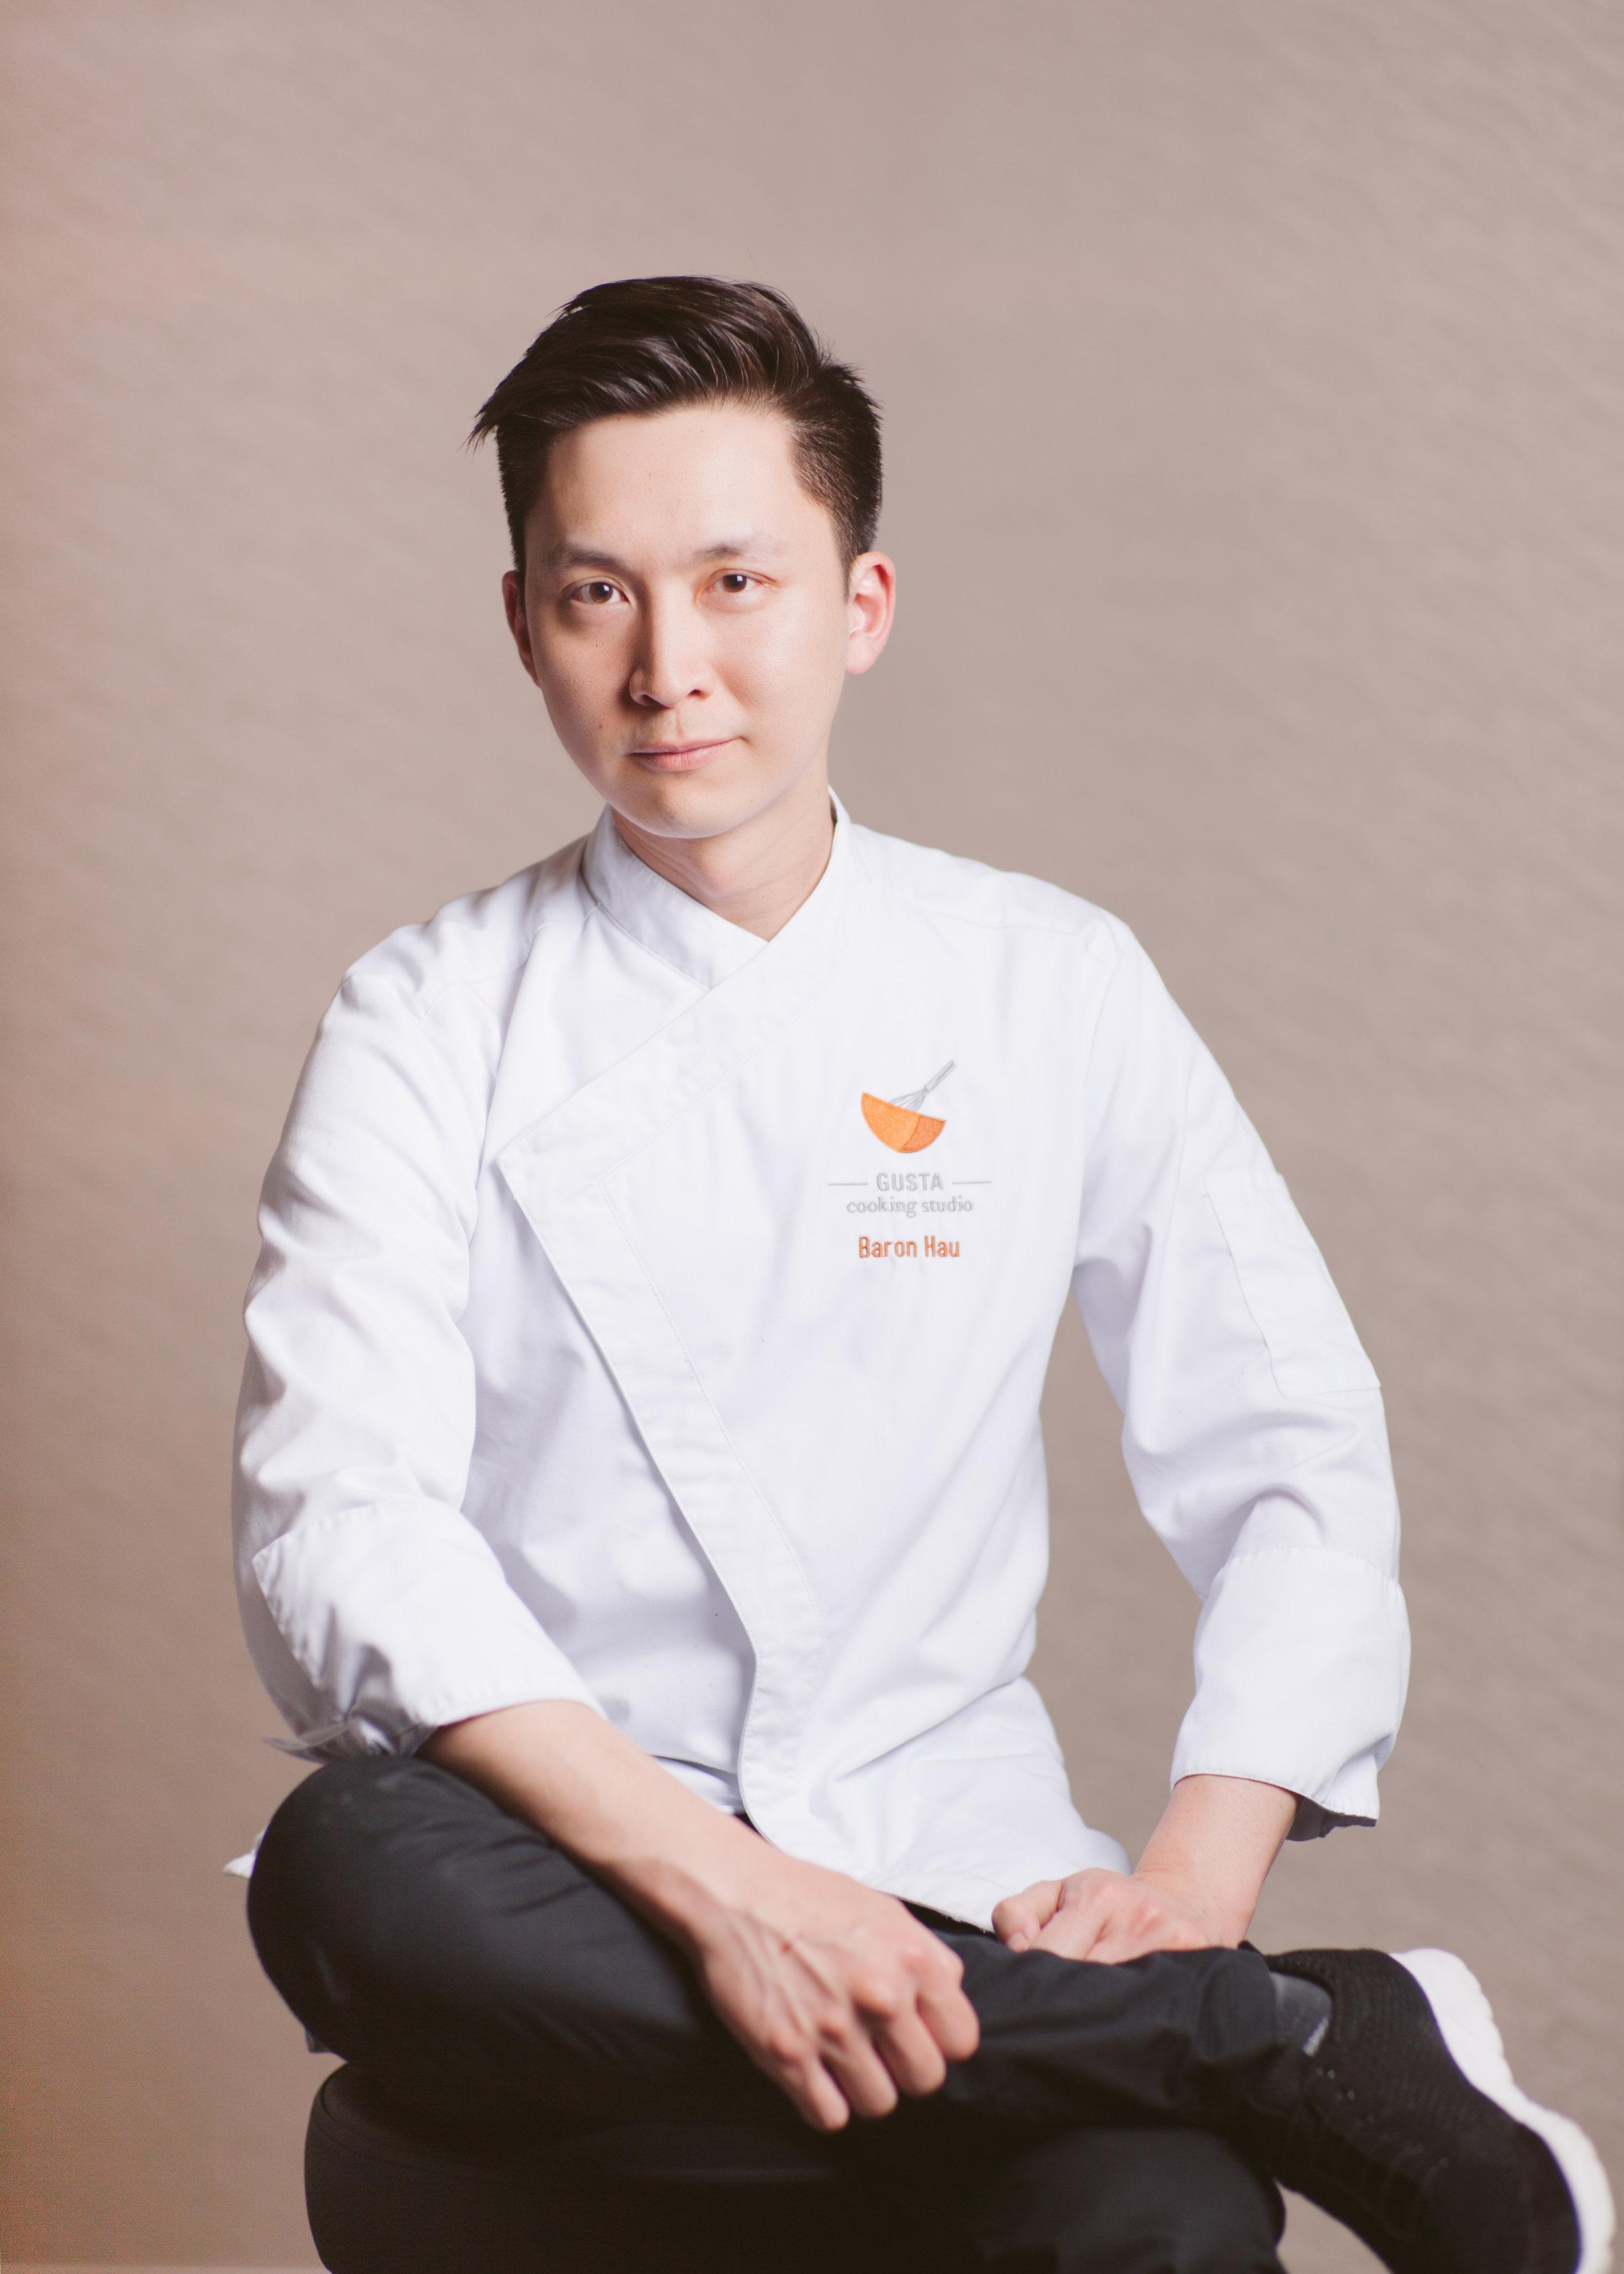 Baron Hau, founding instructor at Gusta Cooking Studio